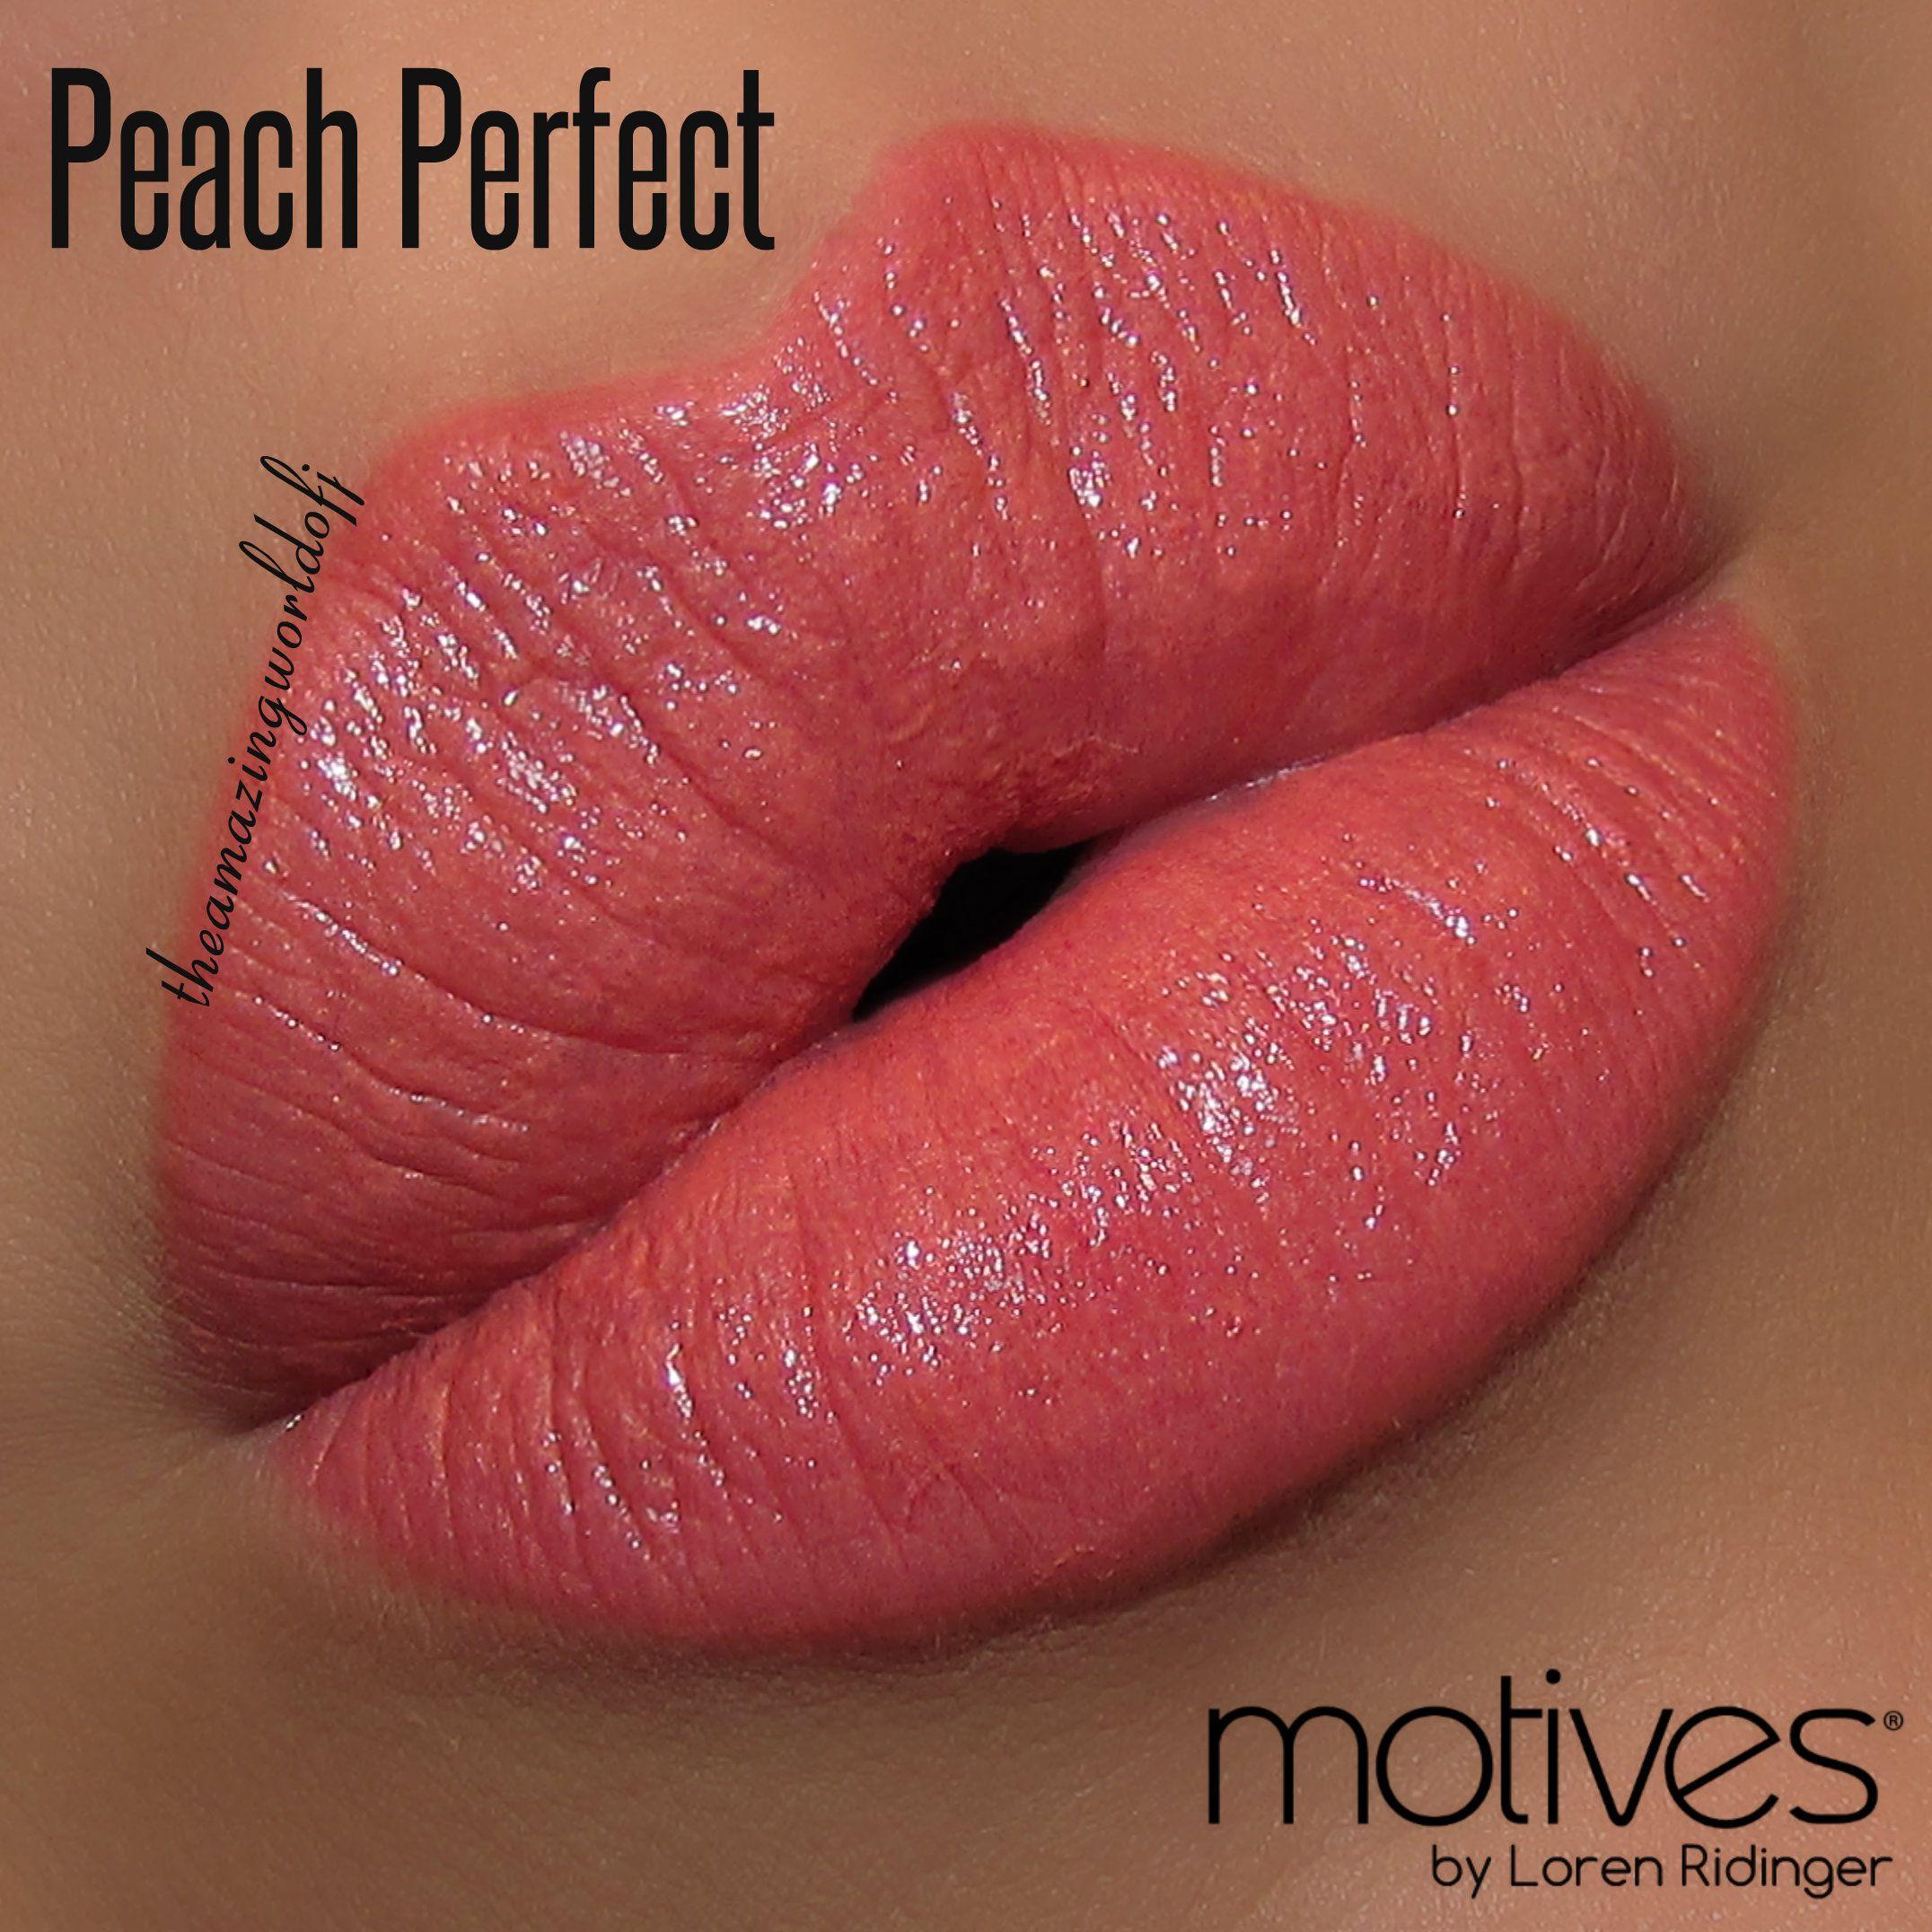 Motives Moisture Rich Lipstick in Peach Perfect. So many